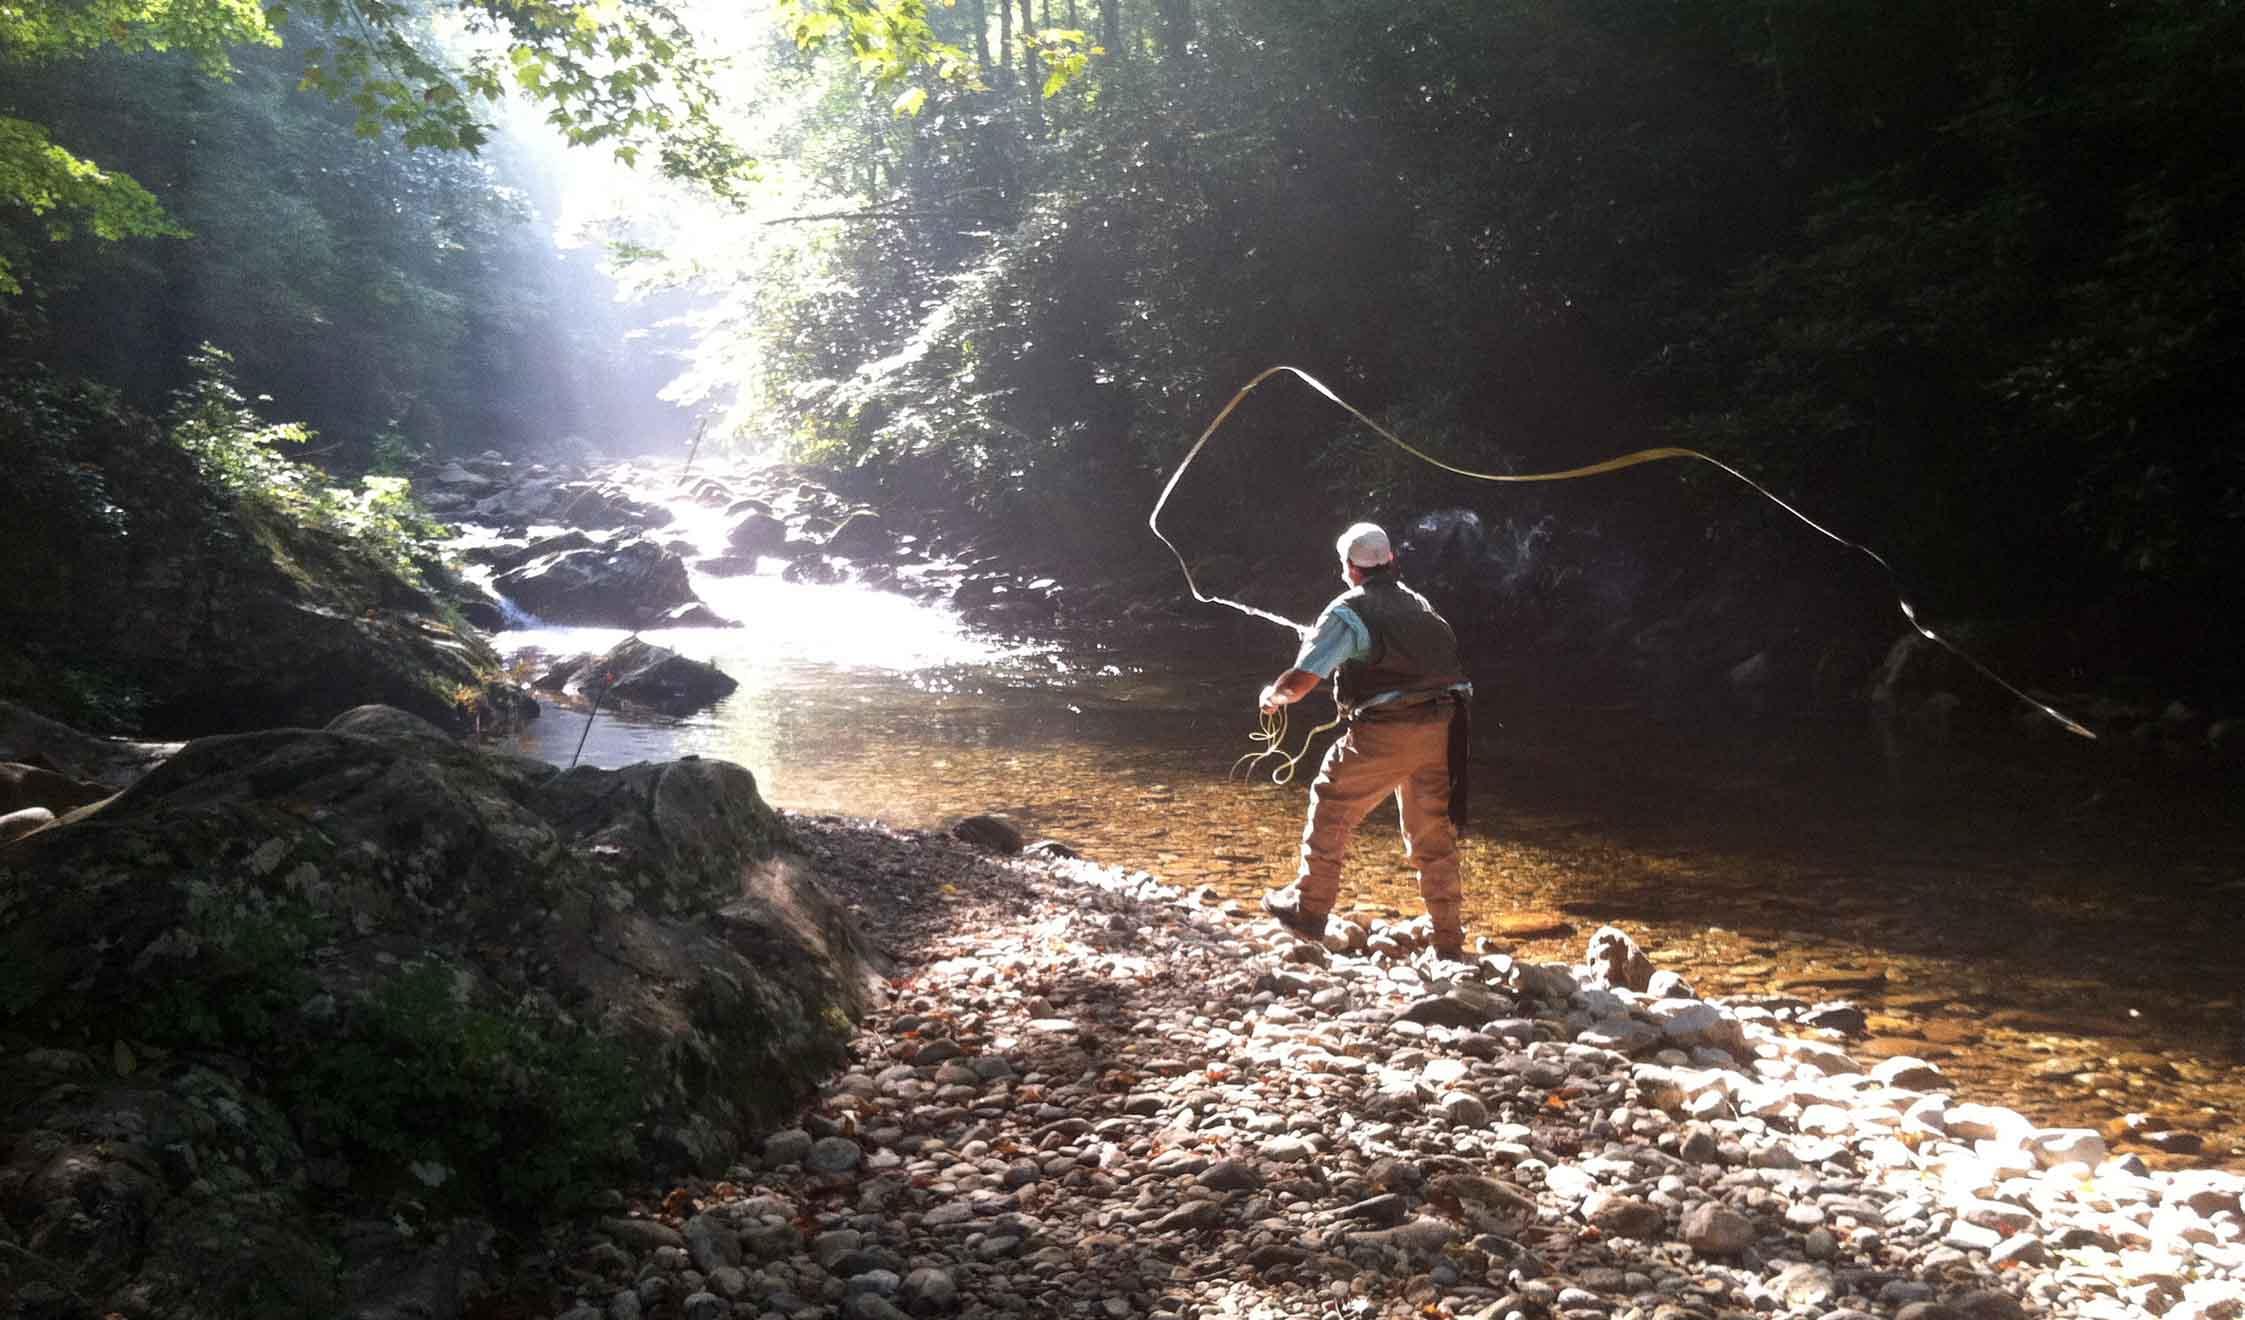 Asheville Fy Fishing Company